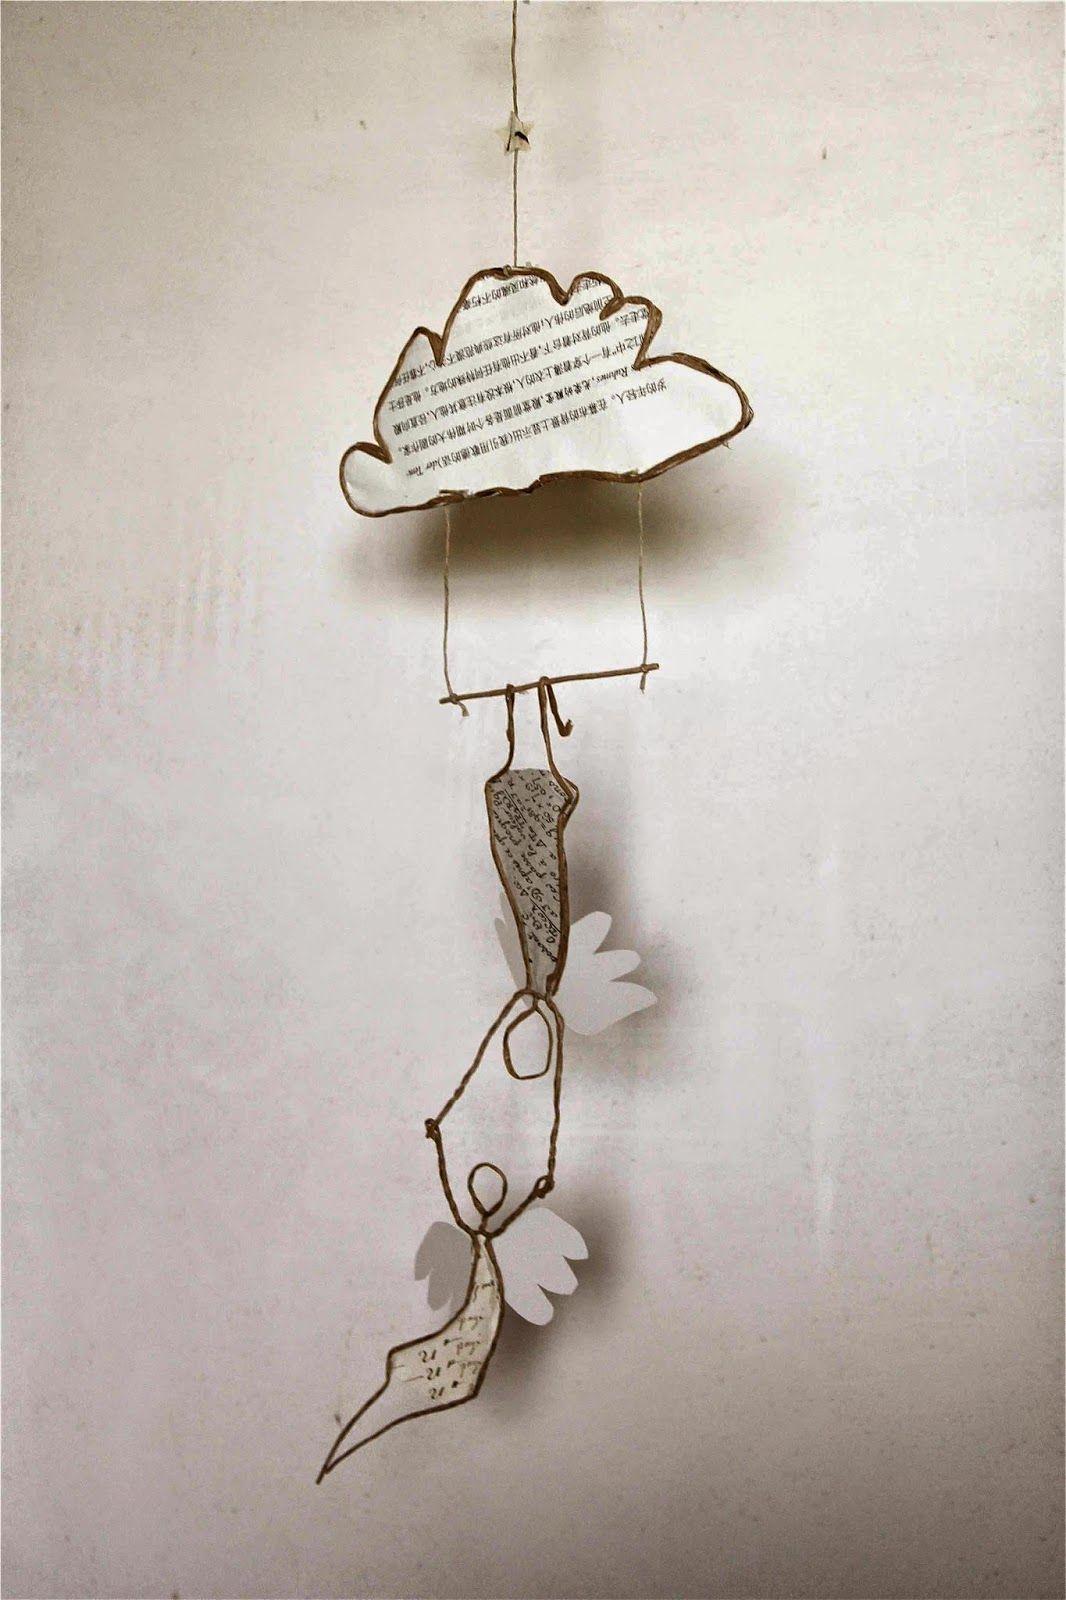 Epistyle les anges font du trapze art amazing wirework epistyle les anges font du trapze wire artdo it yourselfwire solutioingenieria Gallery